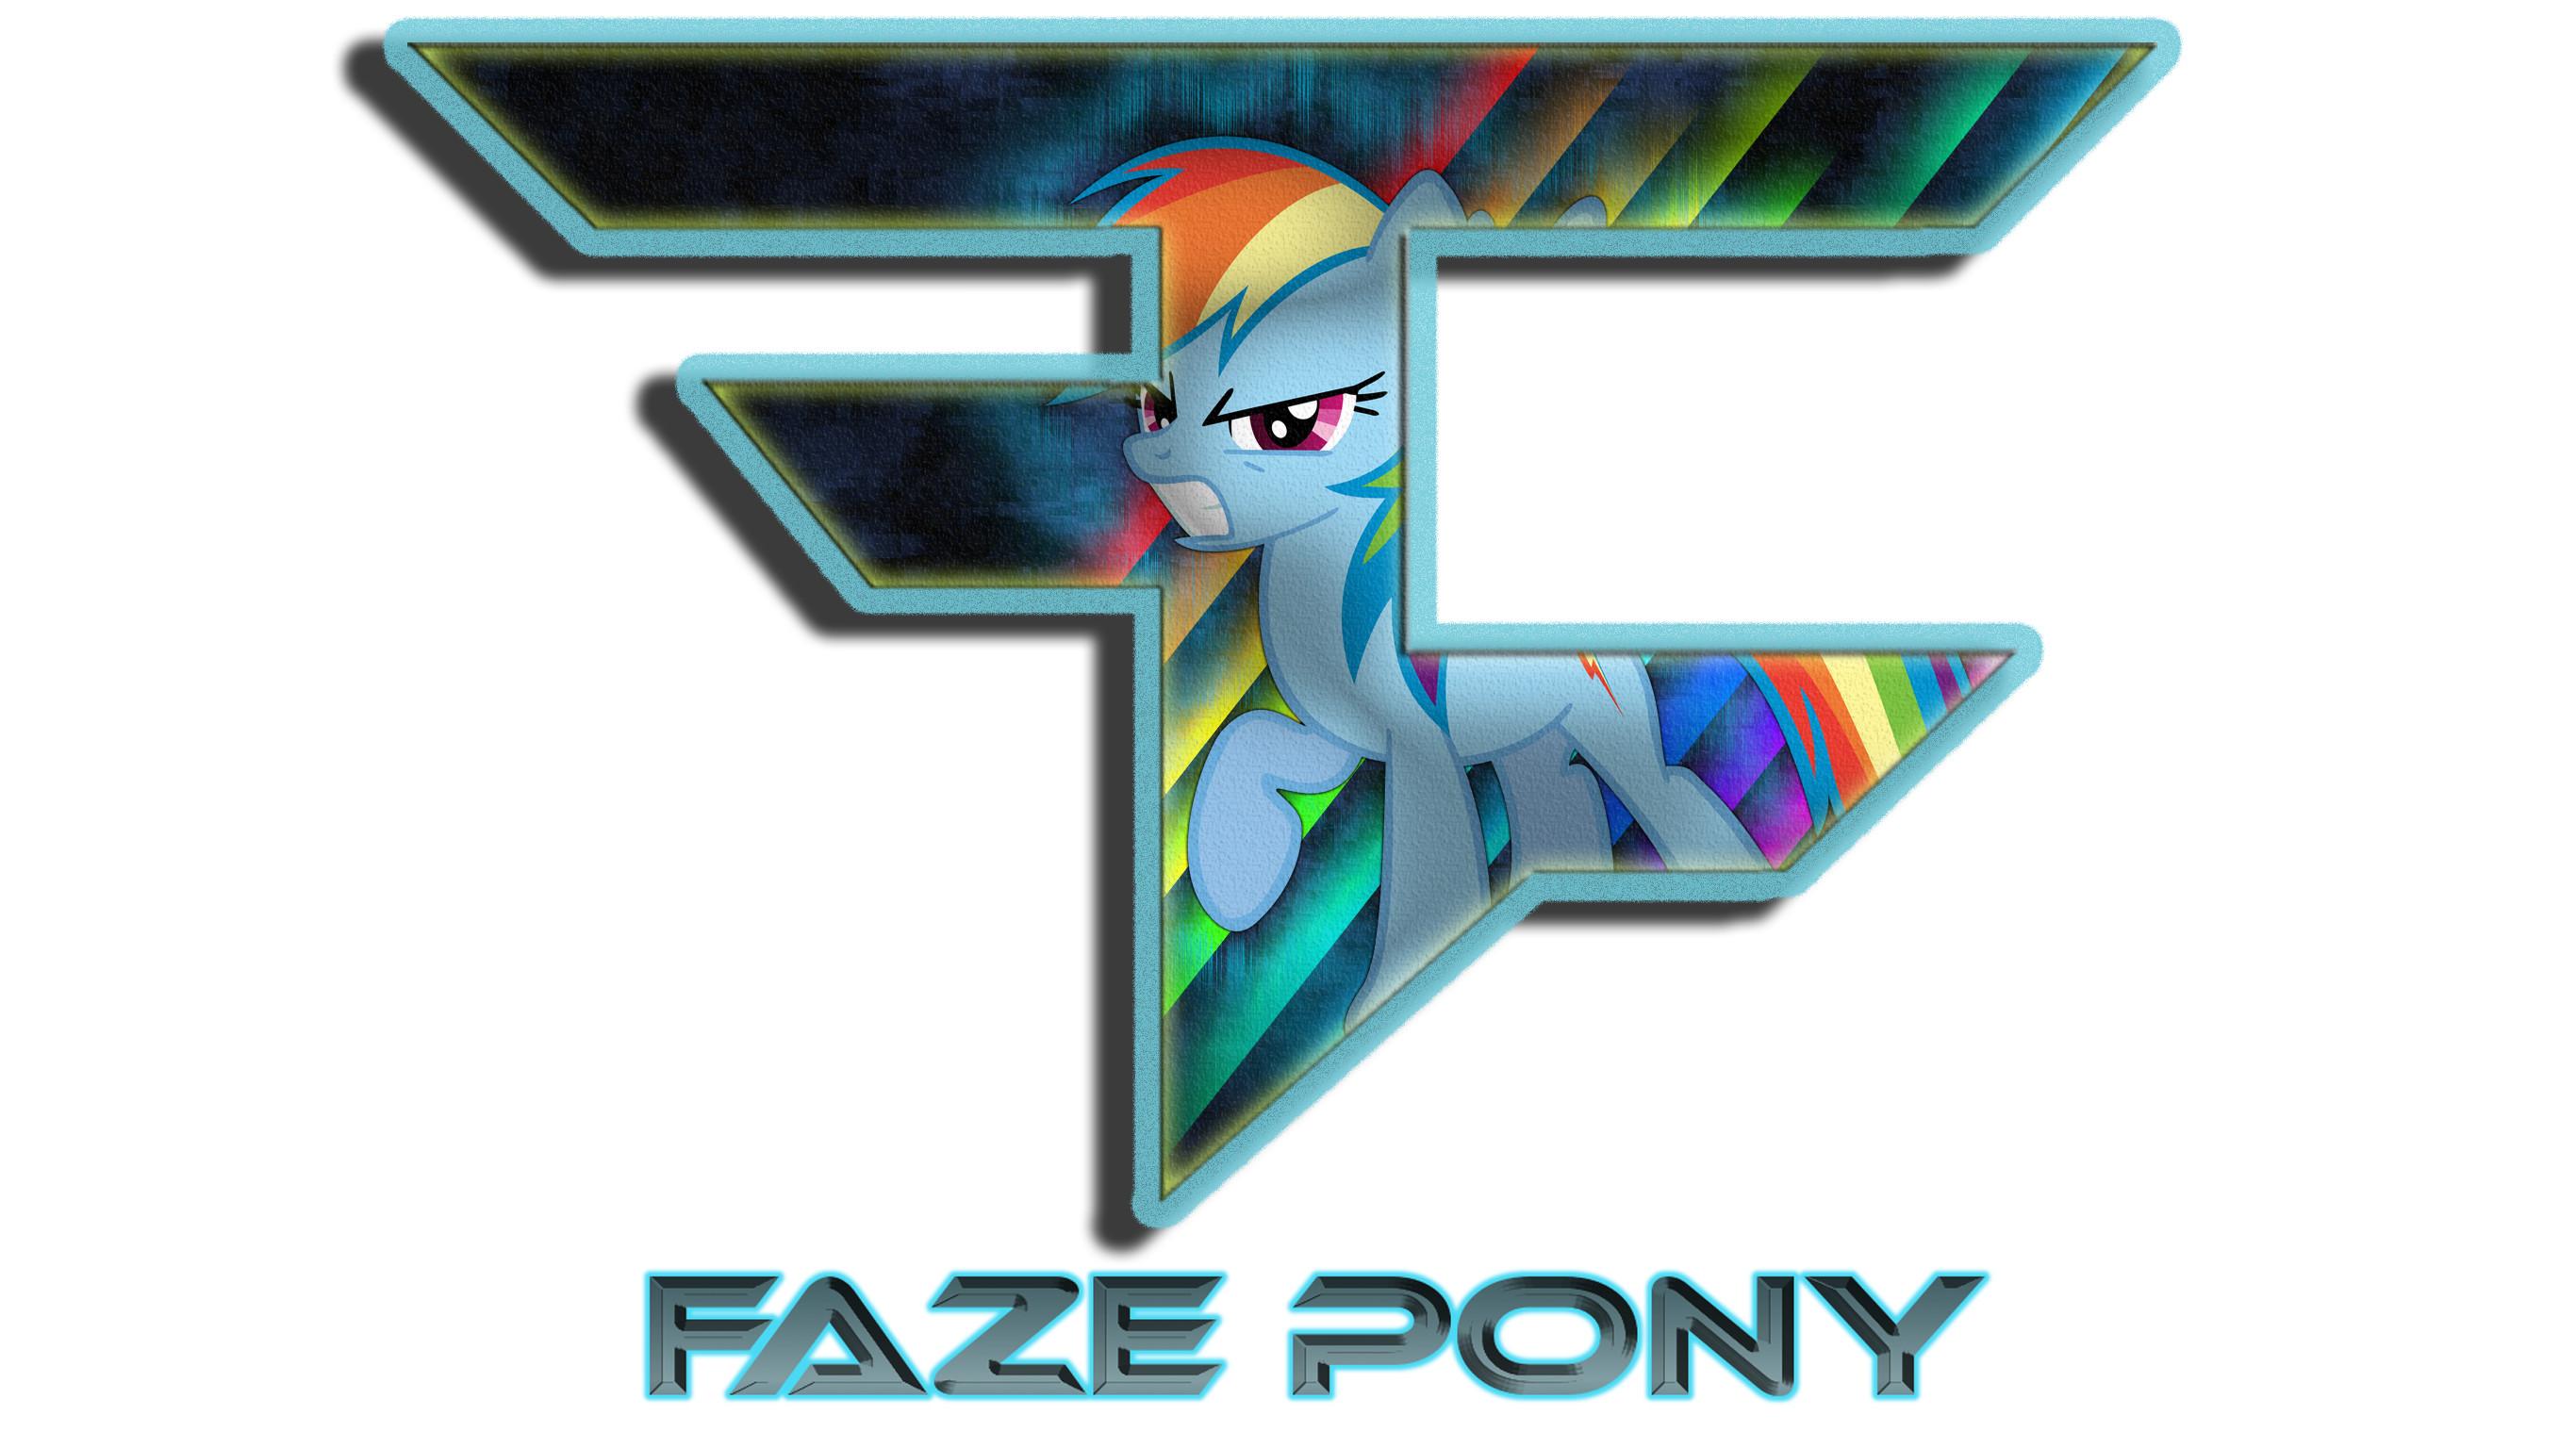 FaZe Pony by RaiinbowDashRD on DeviantArt